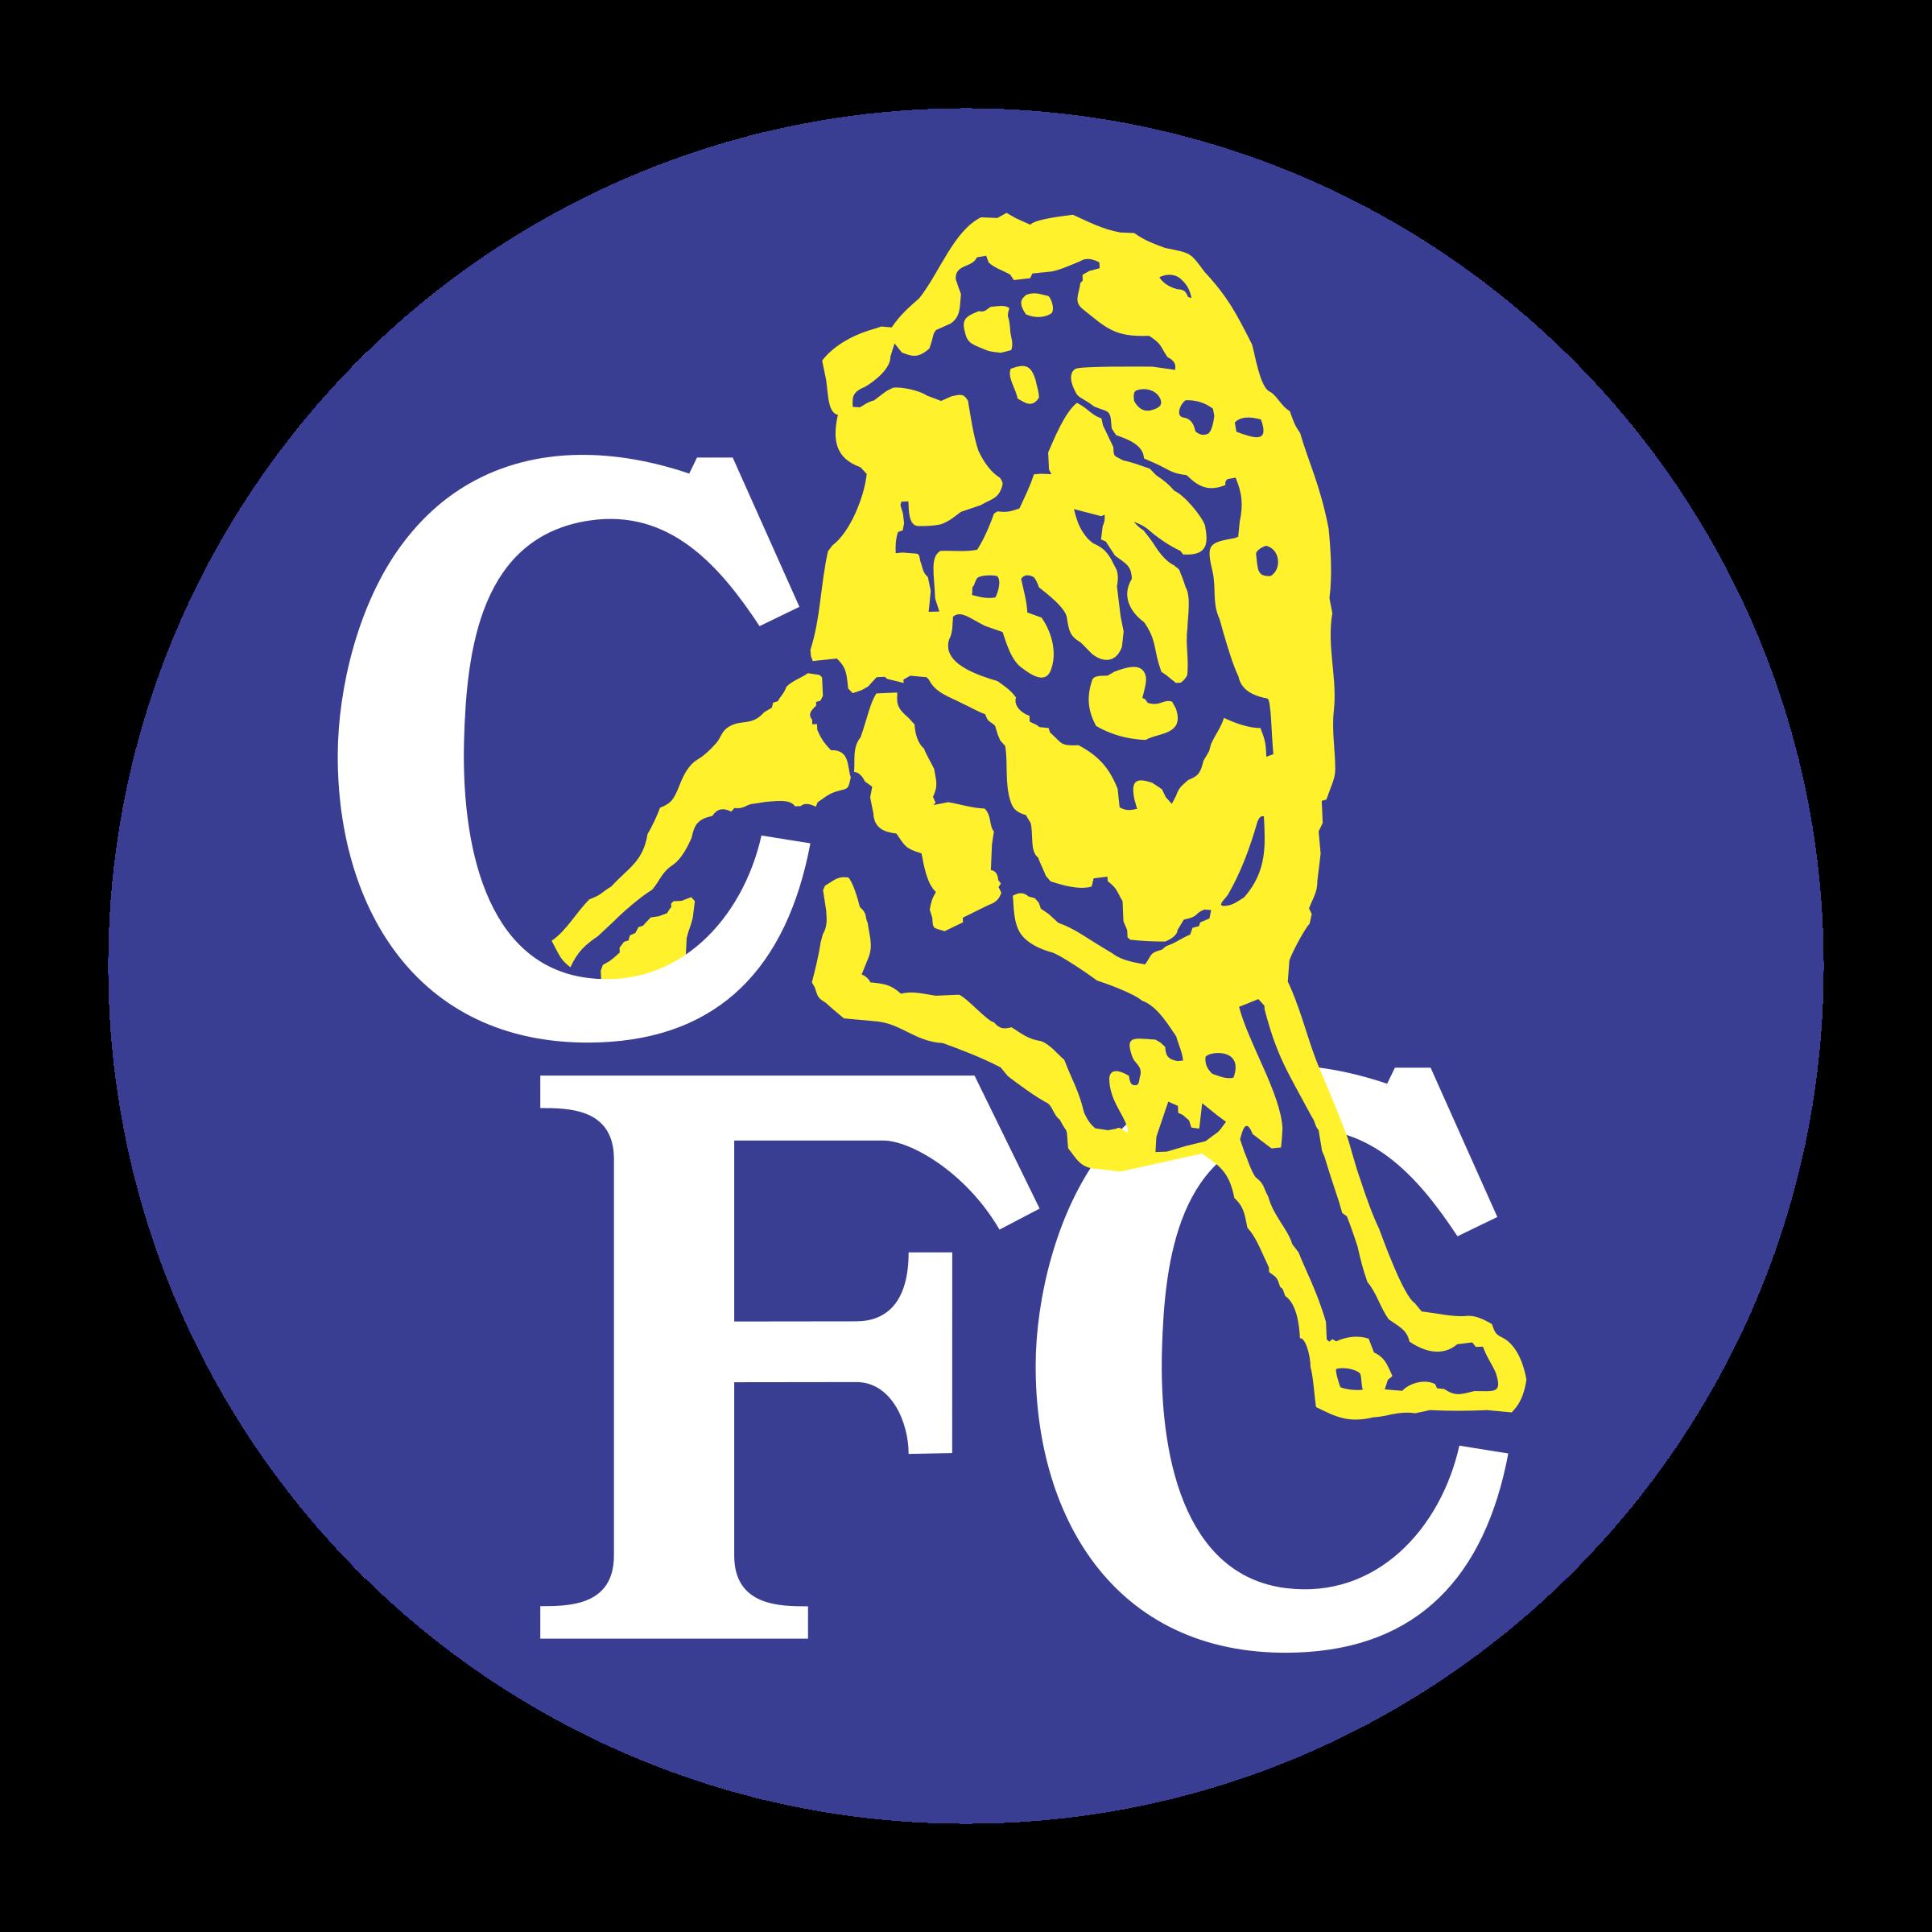 Chelsea FC Logo PNG Transparent & SVG Vector.